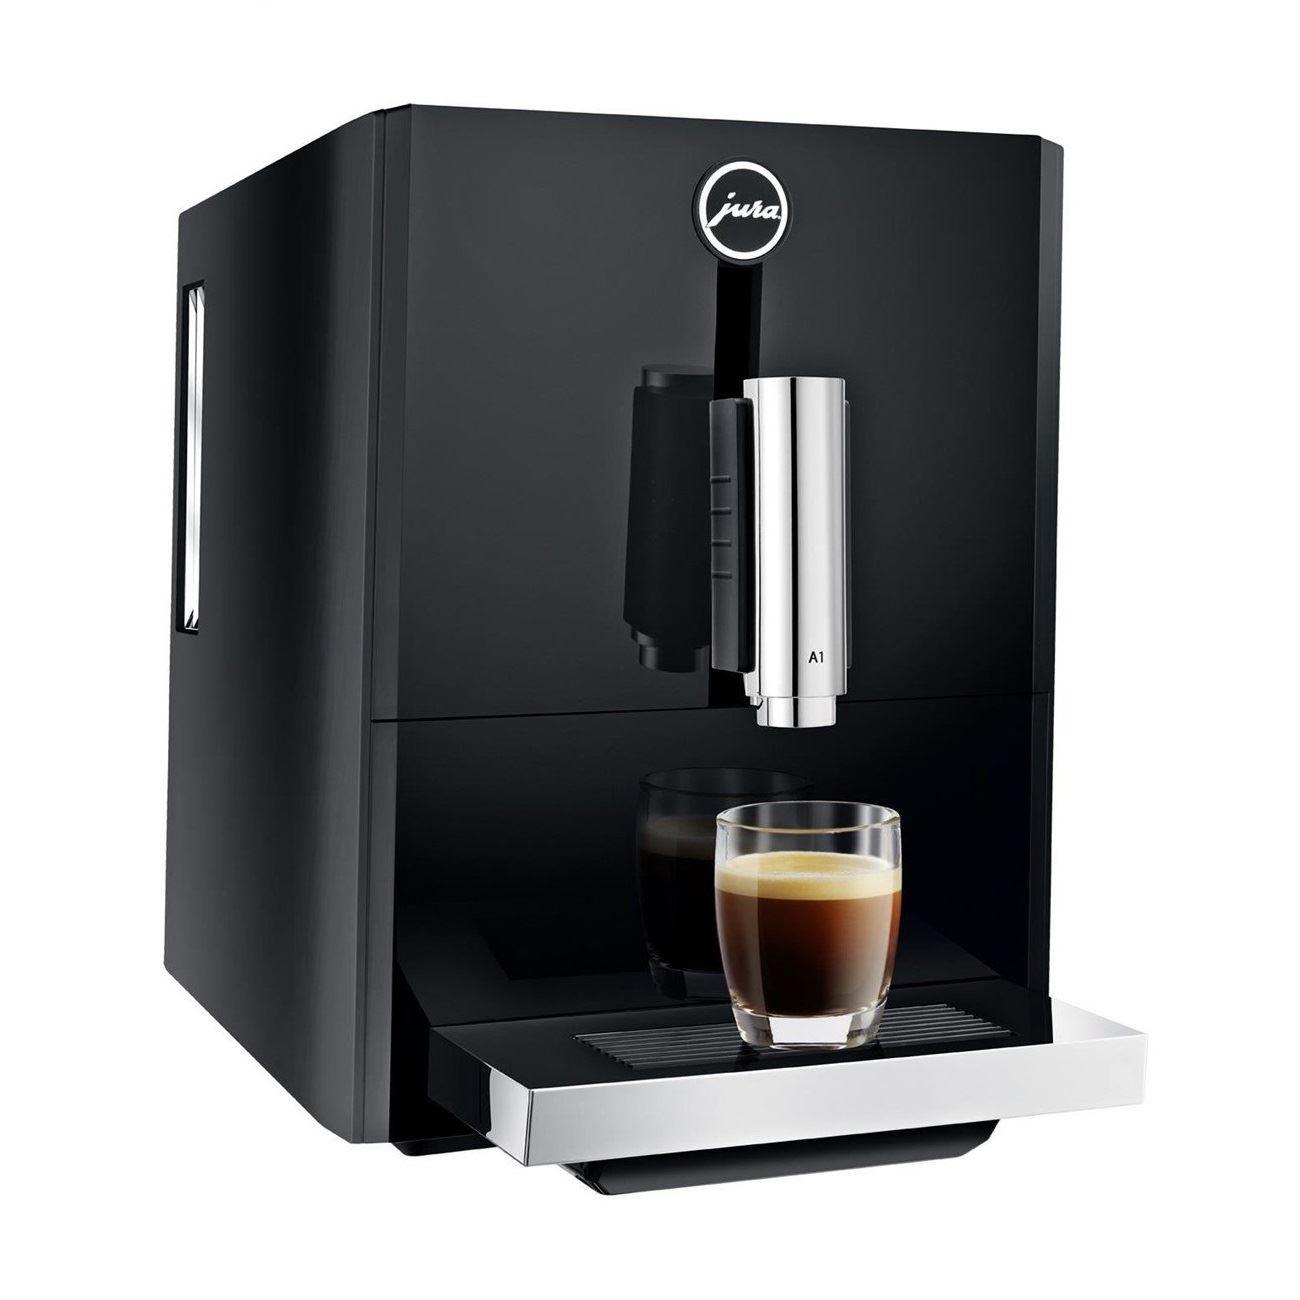 Espressor automat Jura A1, 15 bari, 1.1 l, 125g, rasnita AromaG3, Touch Panel, Negru+ cafea cadou